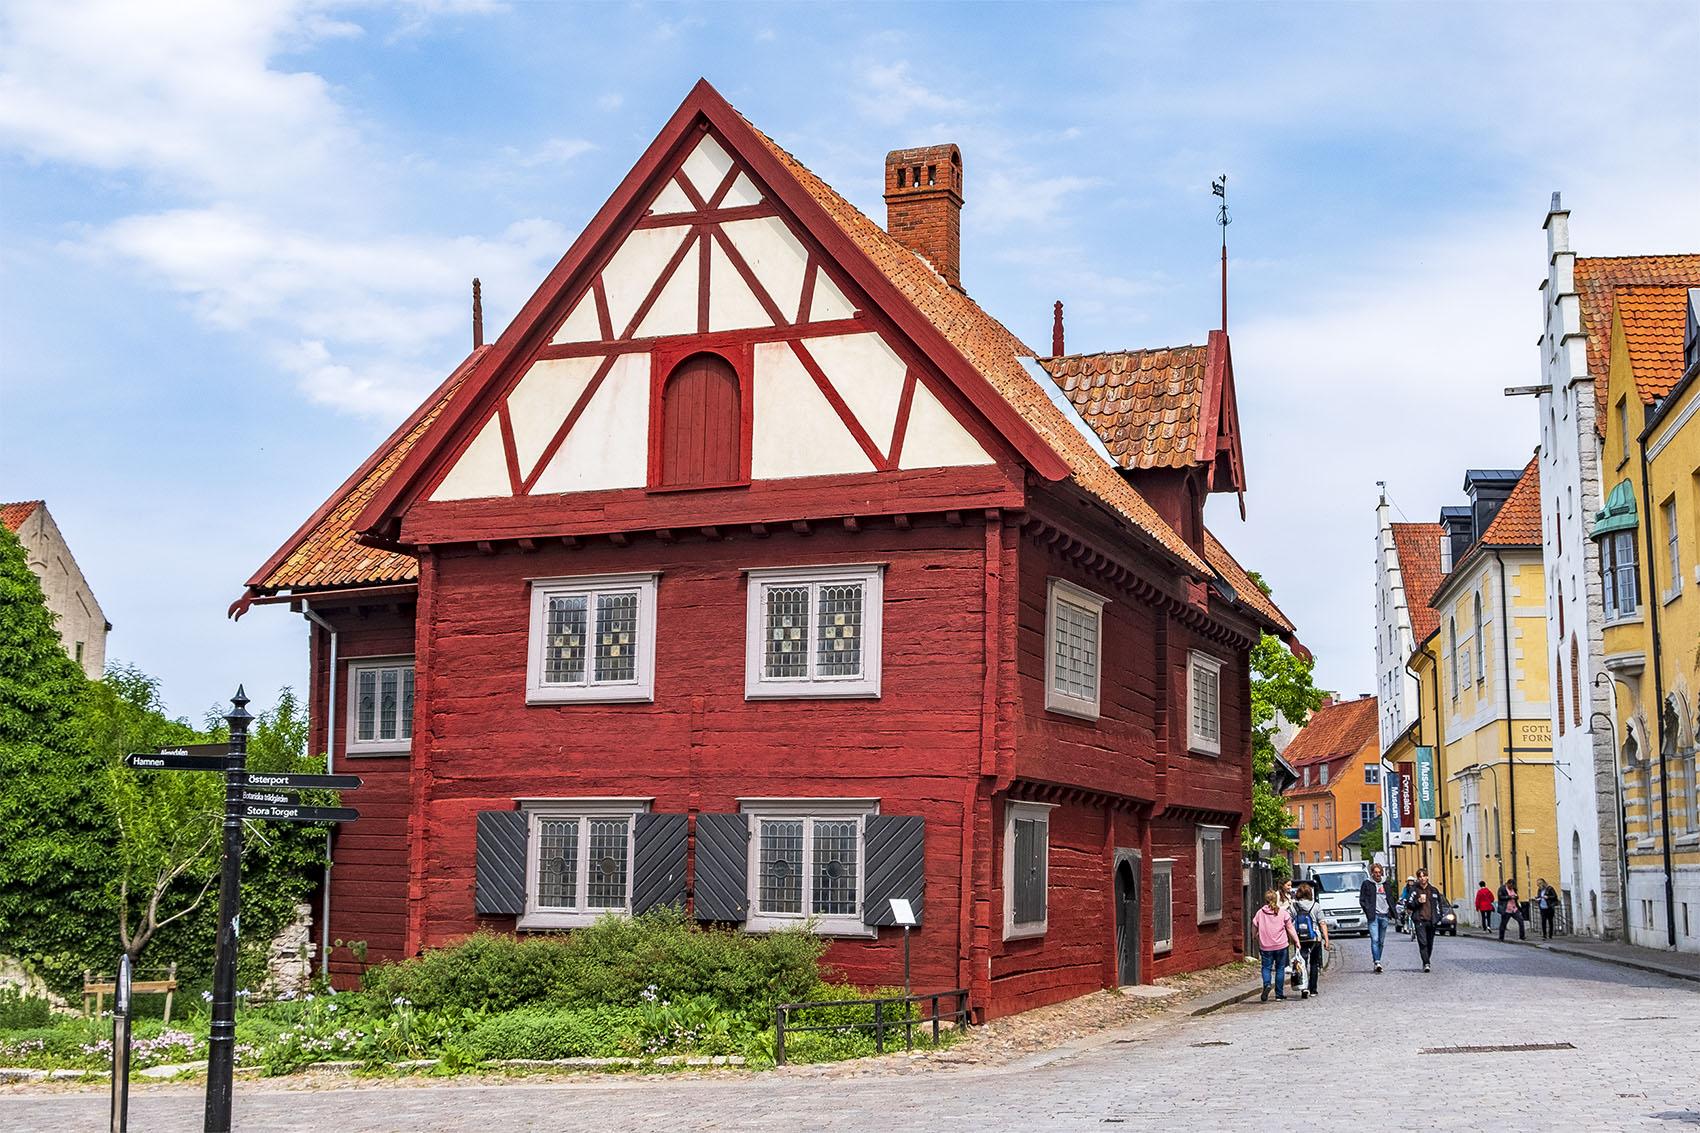 Burmeisterska huset vid Donners plats, Visby